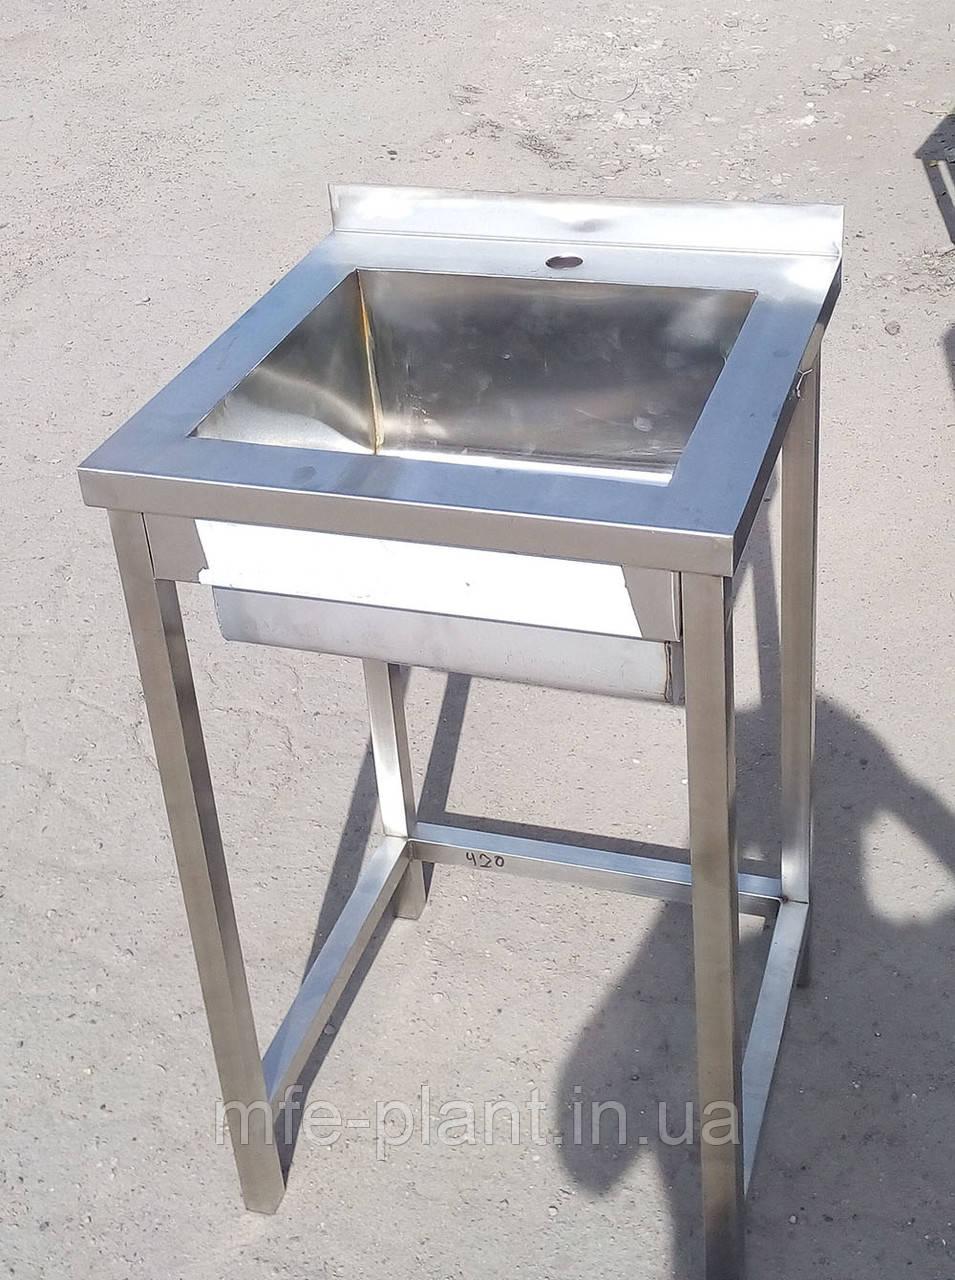 Мойка 1-секционная из нержавейки 700х600х850 (гл.300мм)